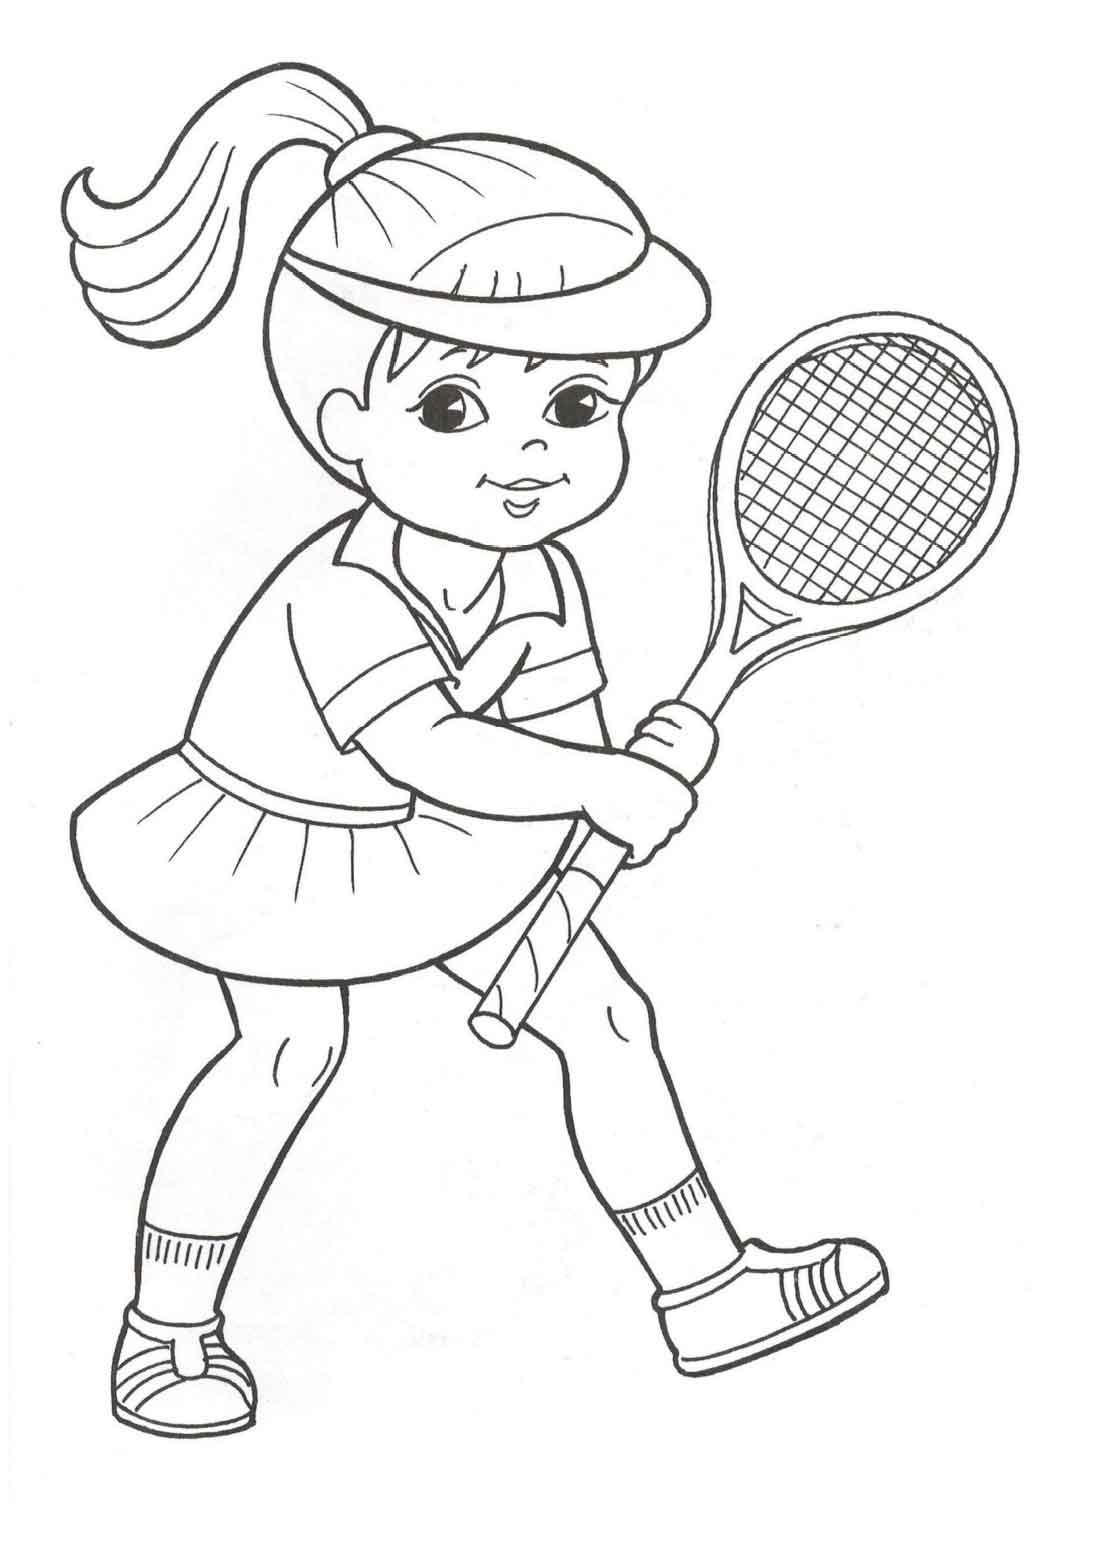 http://coloring06.narod.ru/lyudi/sport/2.jpg